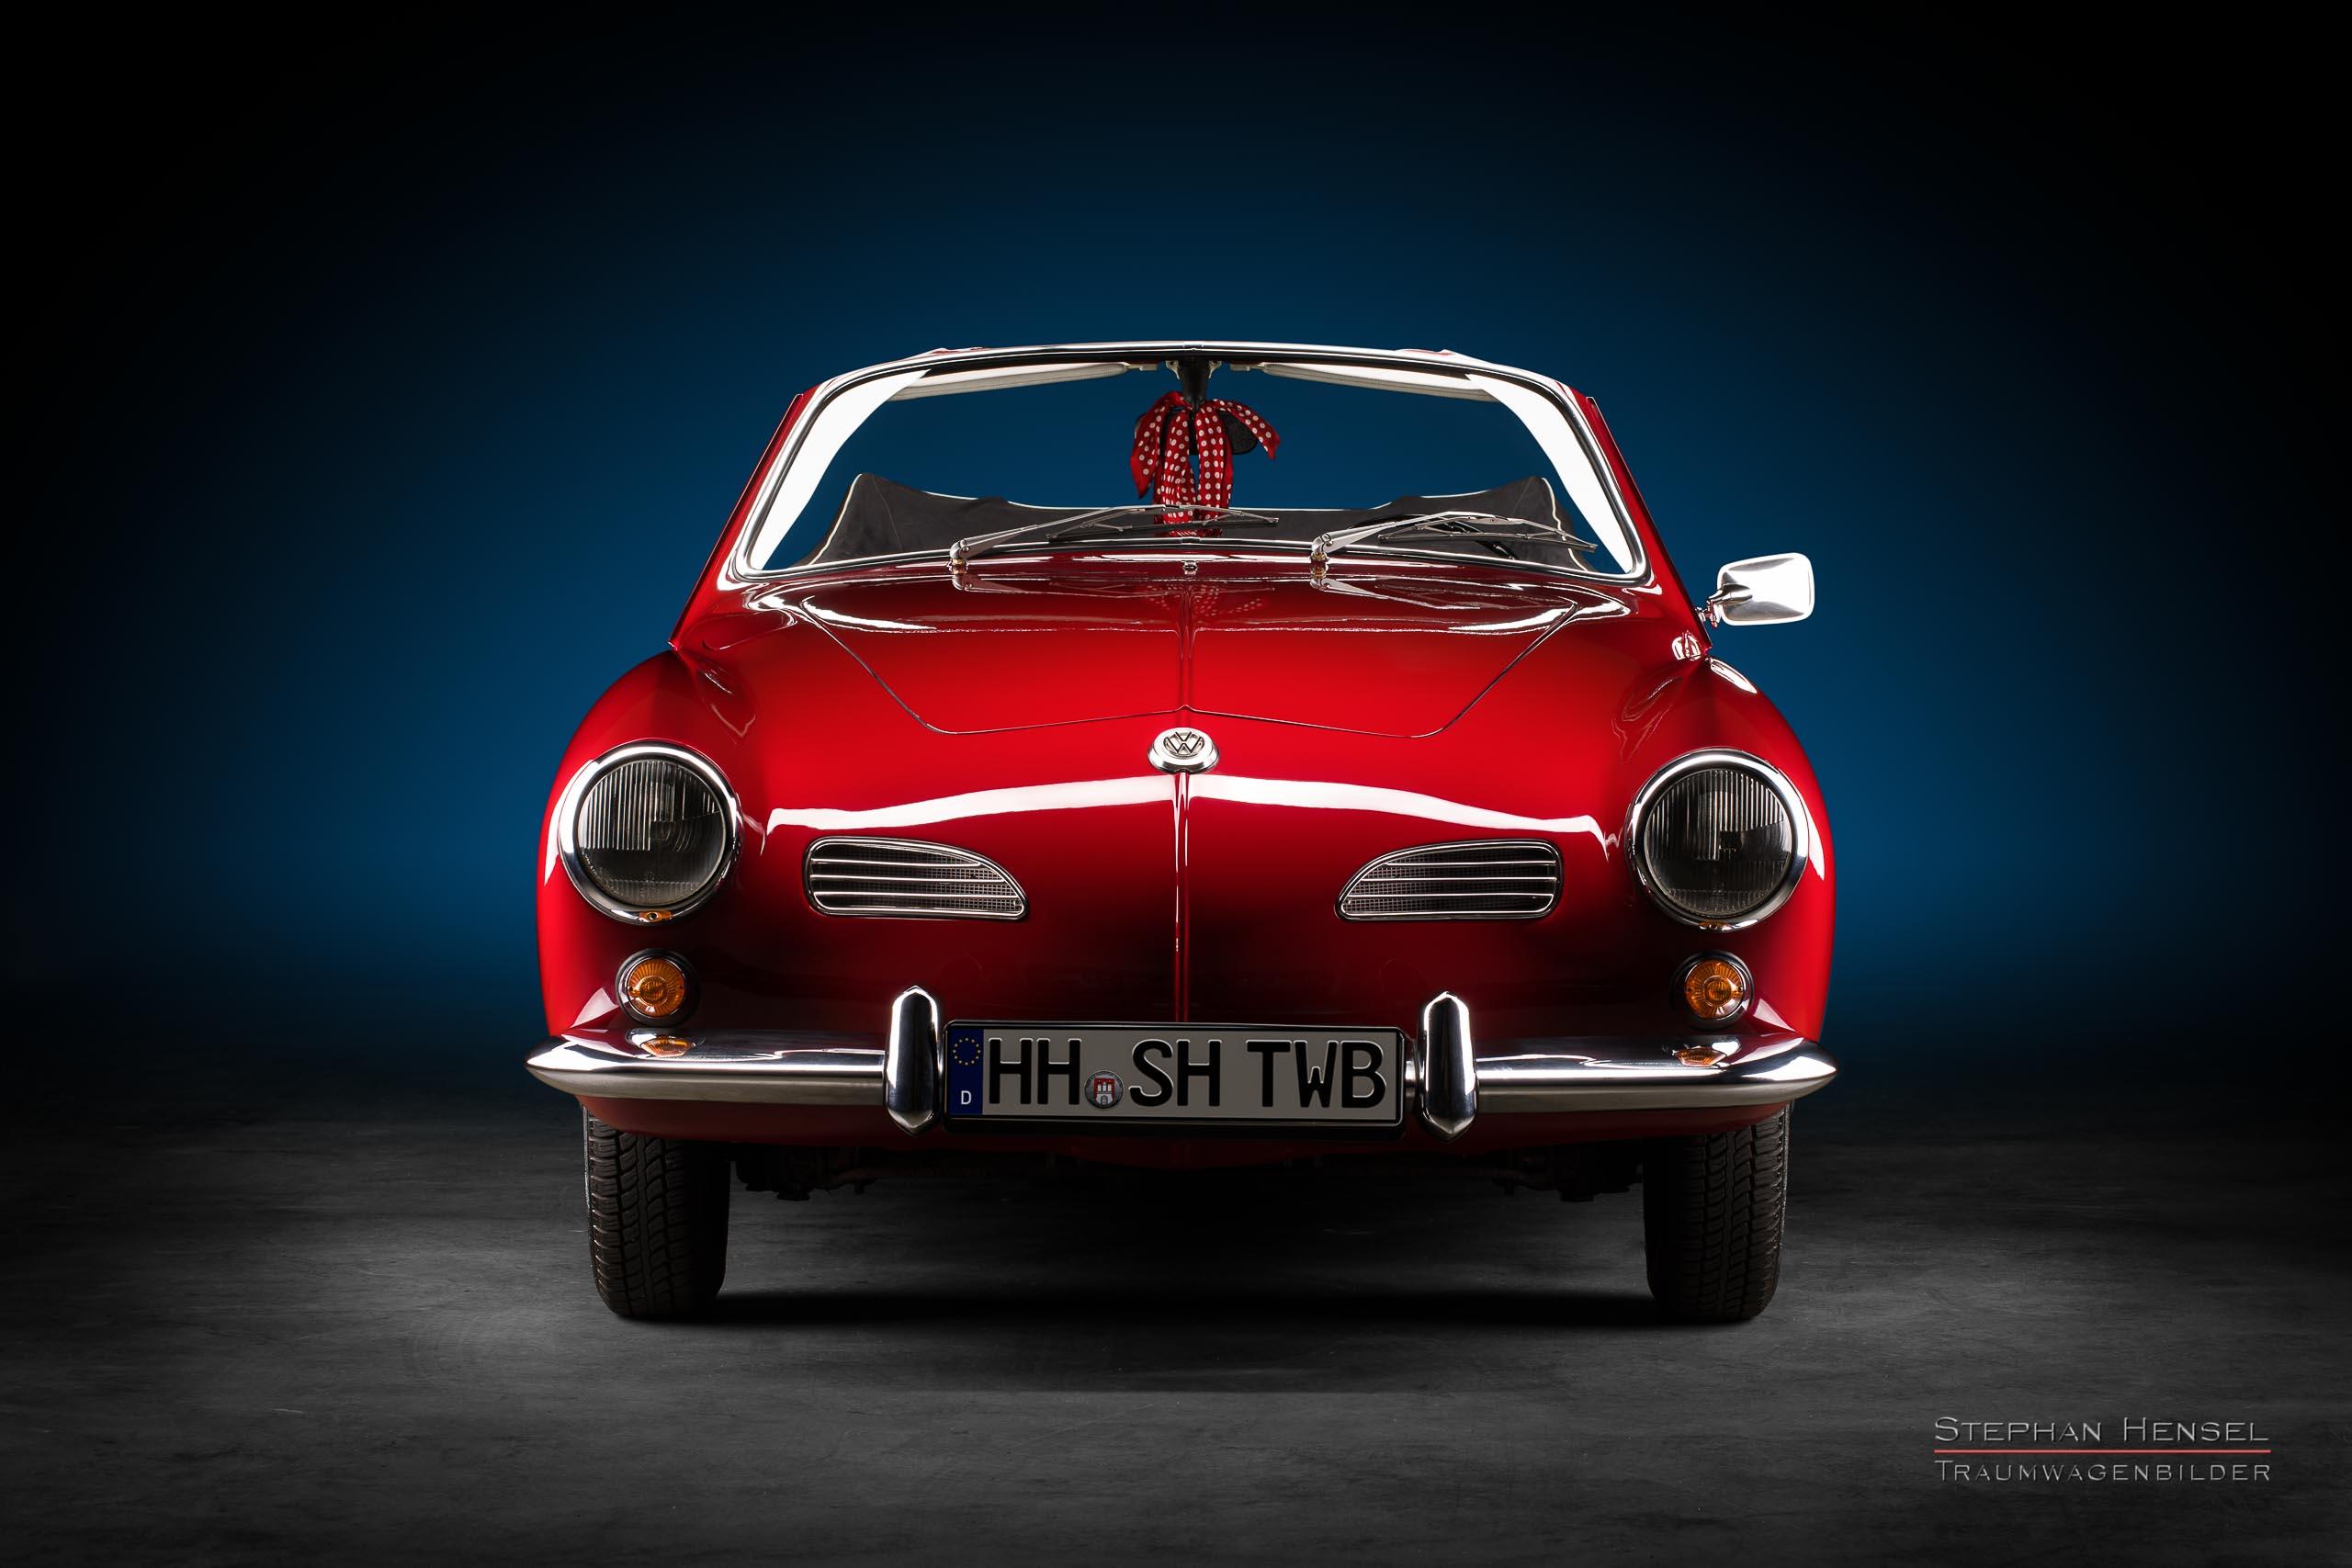 VW Karmann-Ghia Typ 14, 1967, Frontalansicht, Autofotograf, Hamburg, Automobilfotograf, Oldtimerfotograf, Oldtimerfotografie, Car Photography, Stephan Hensel